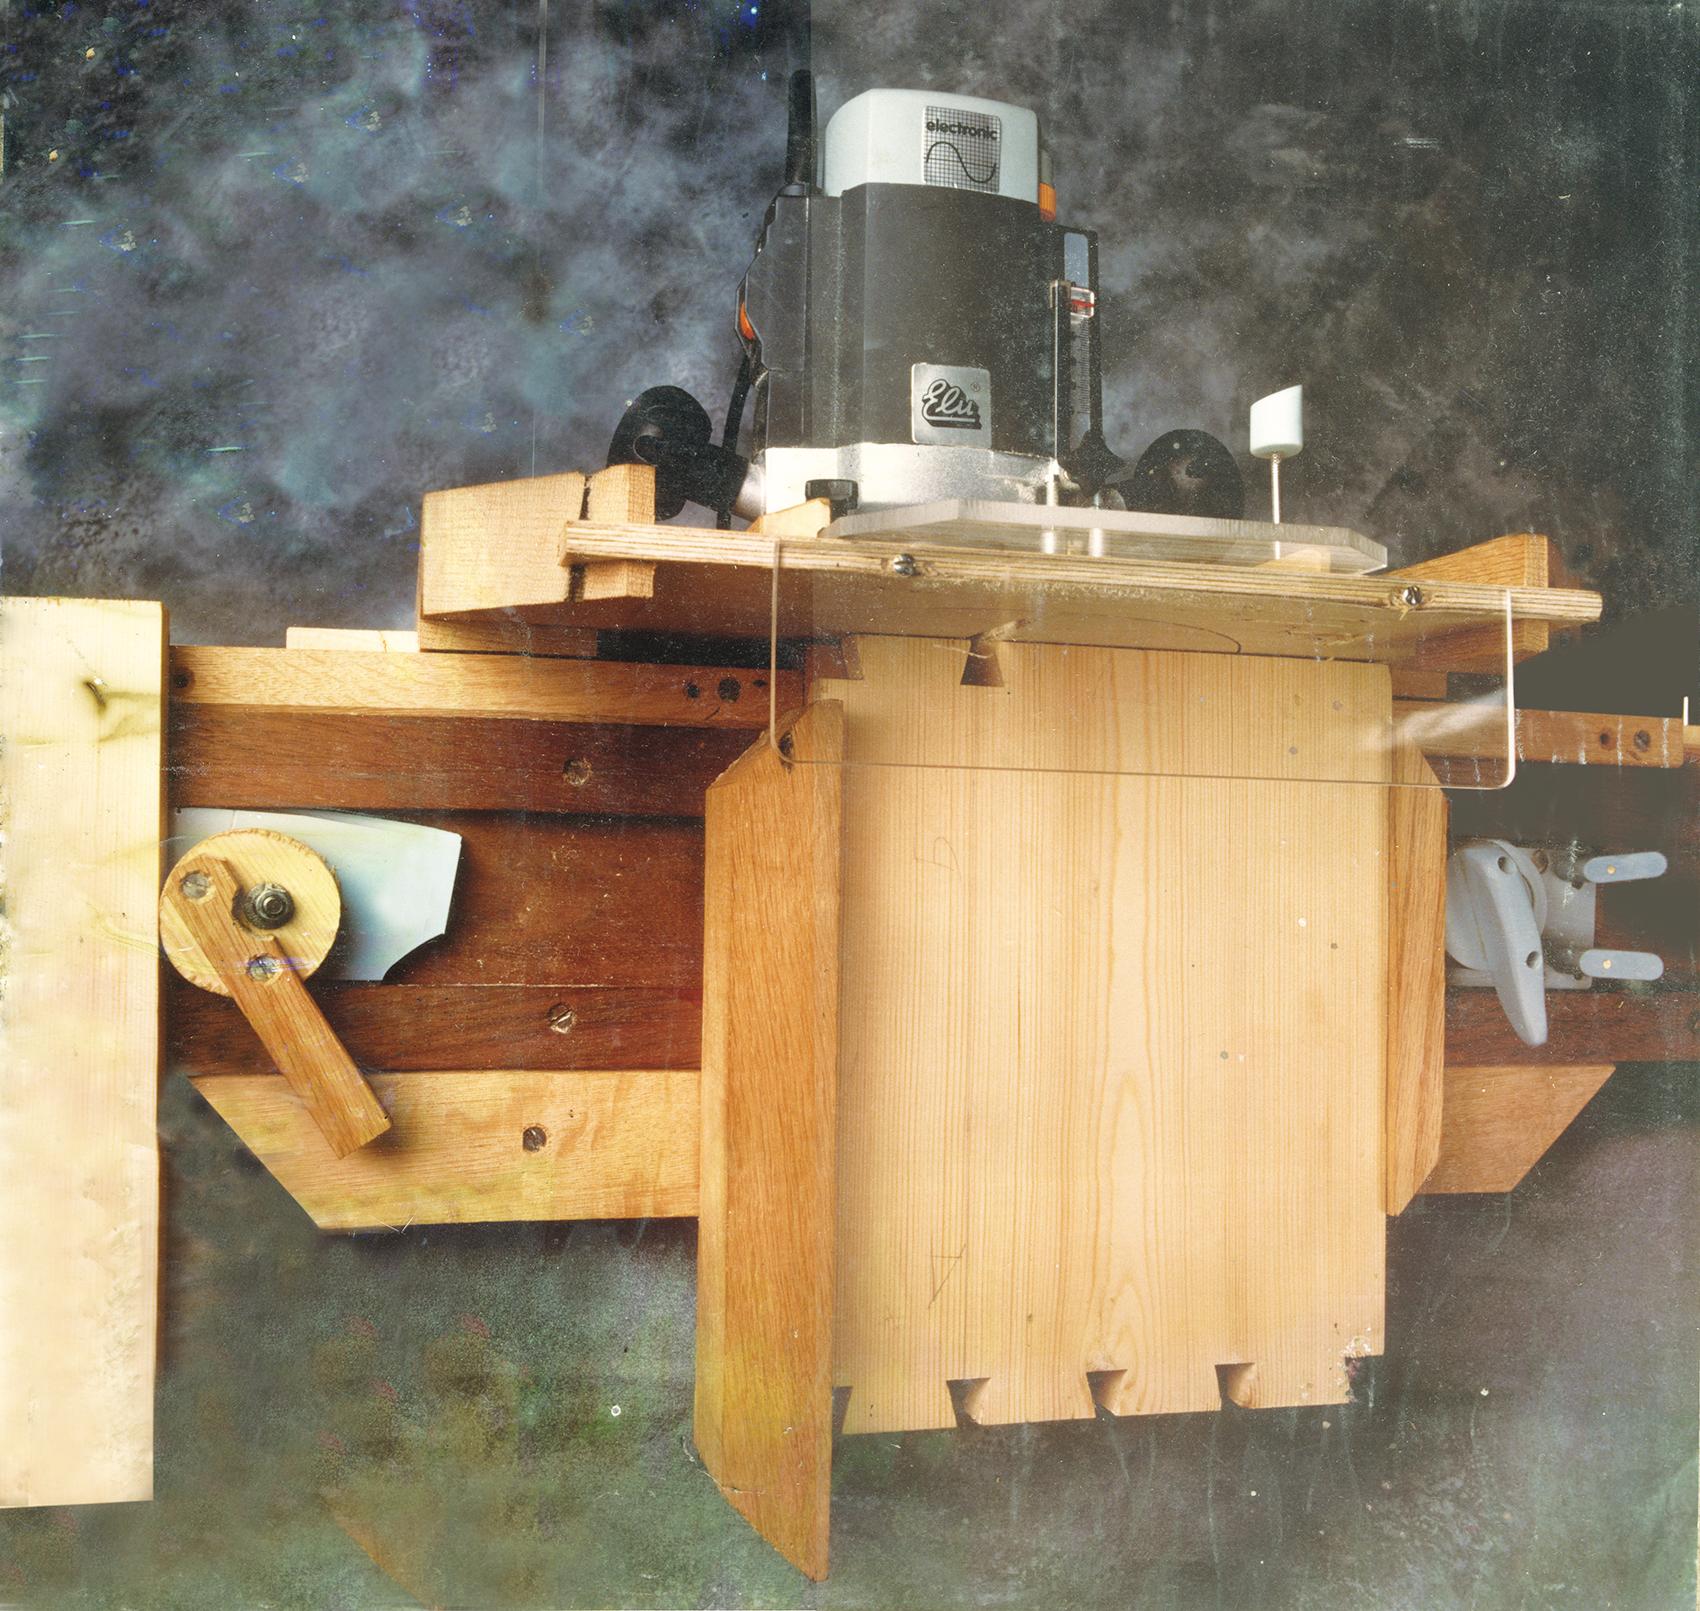 The first WoodRat prototype